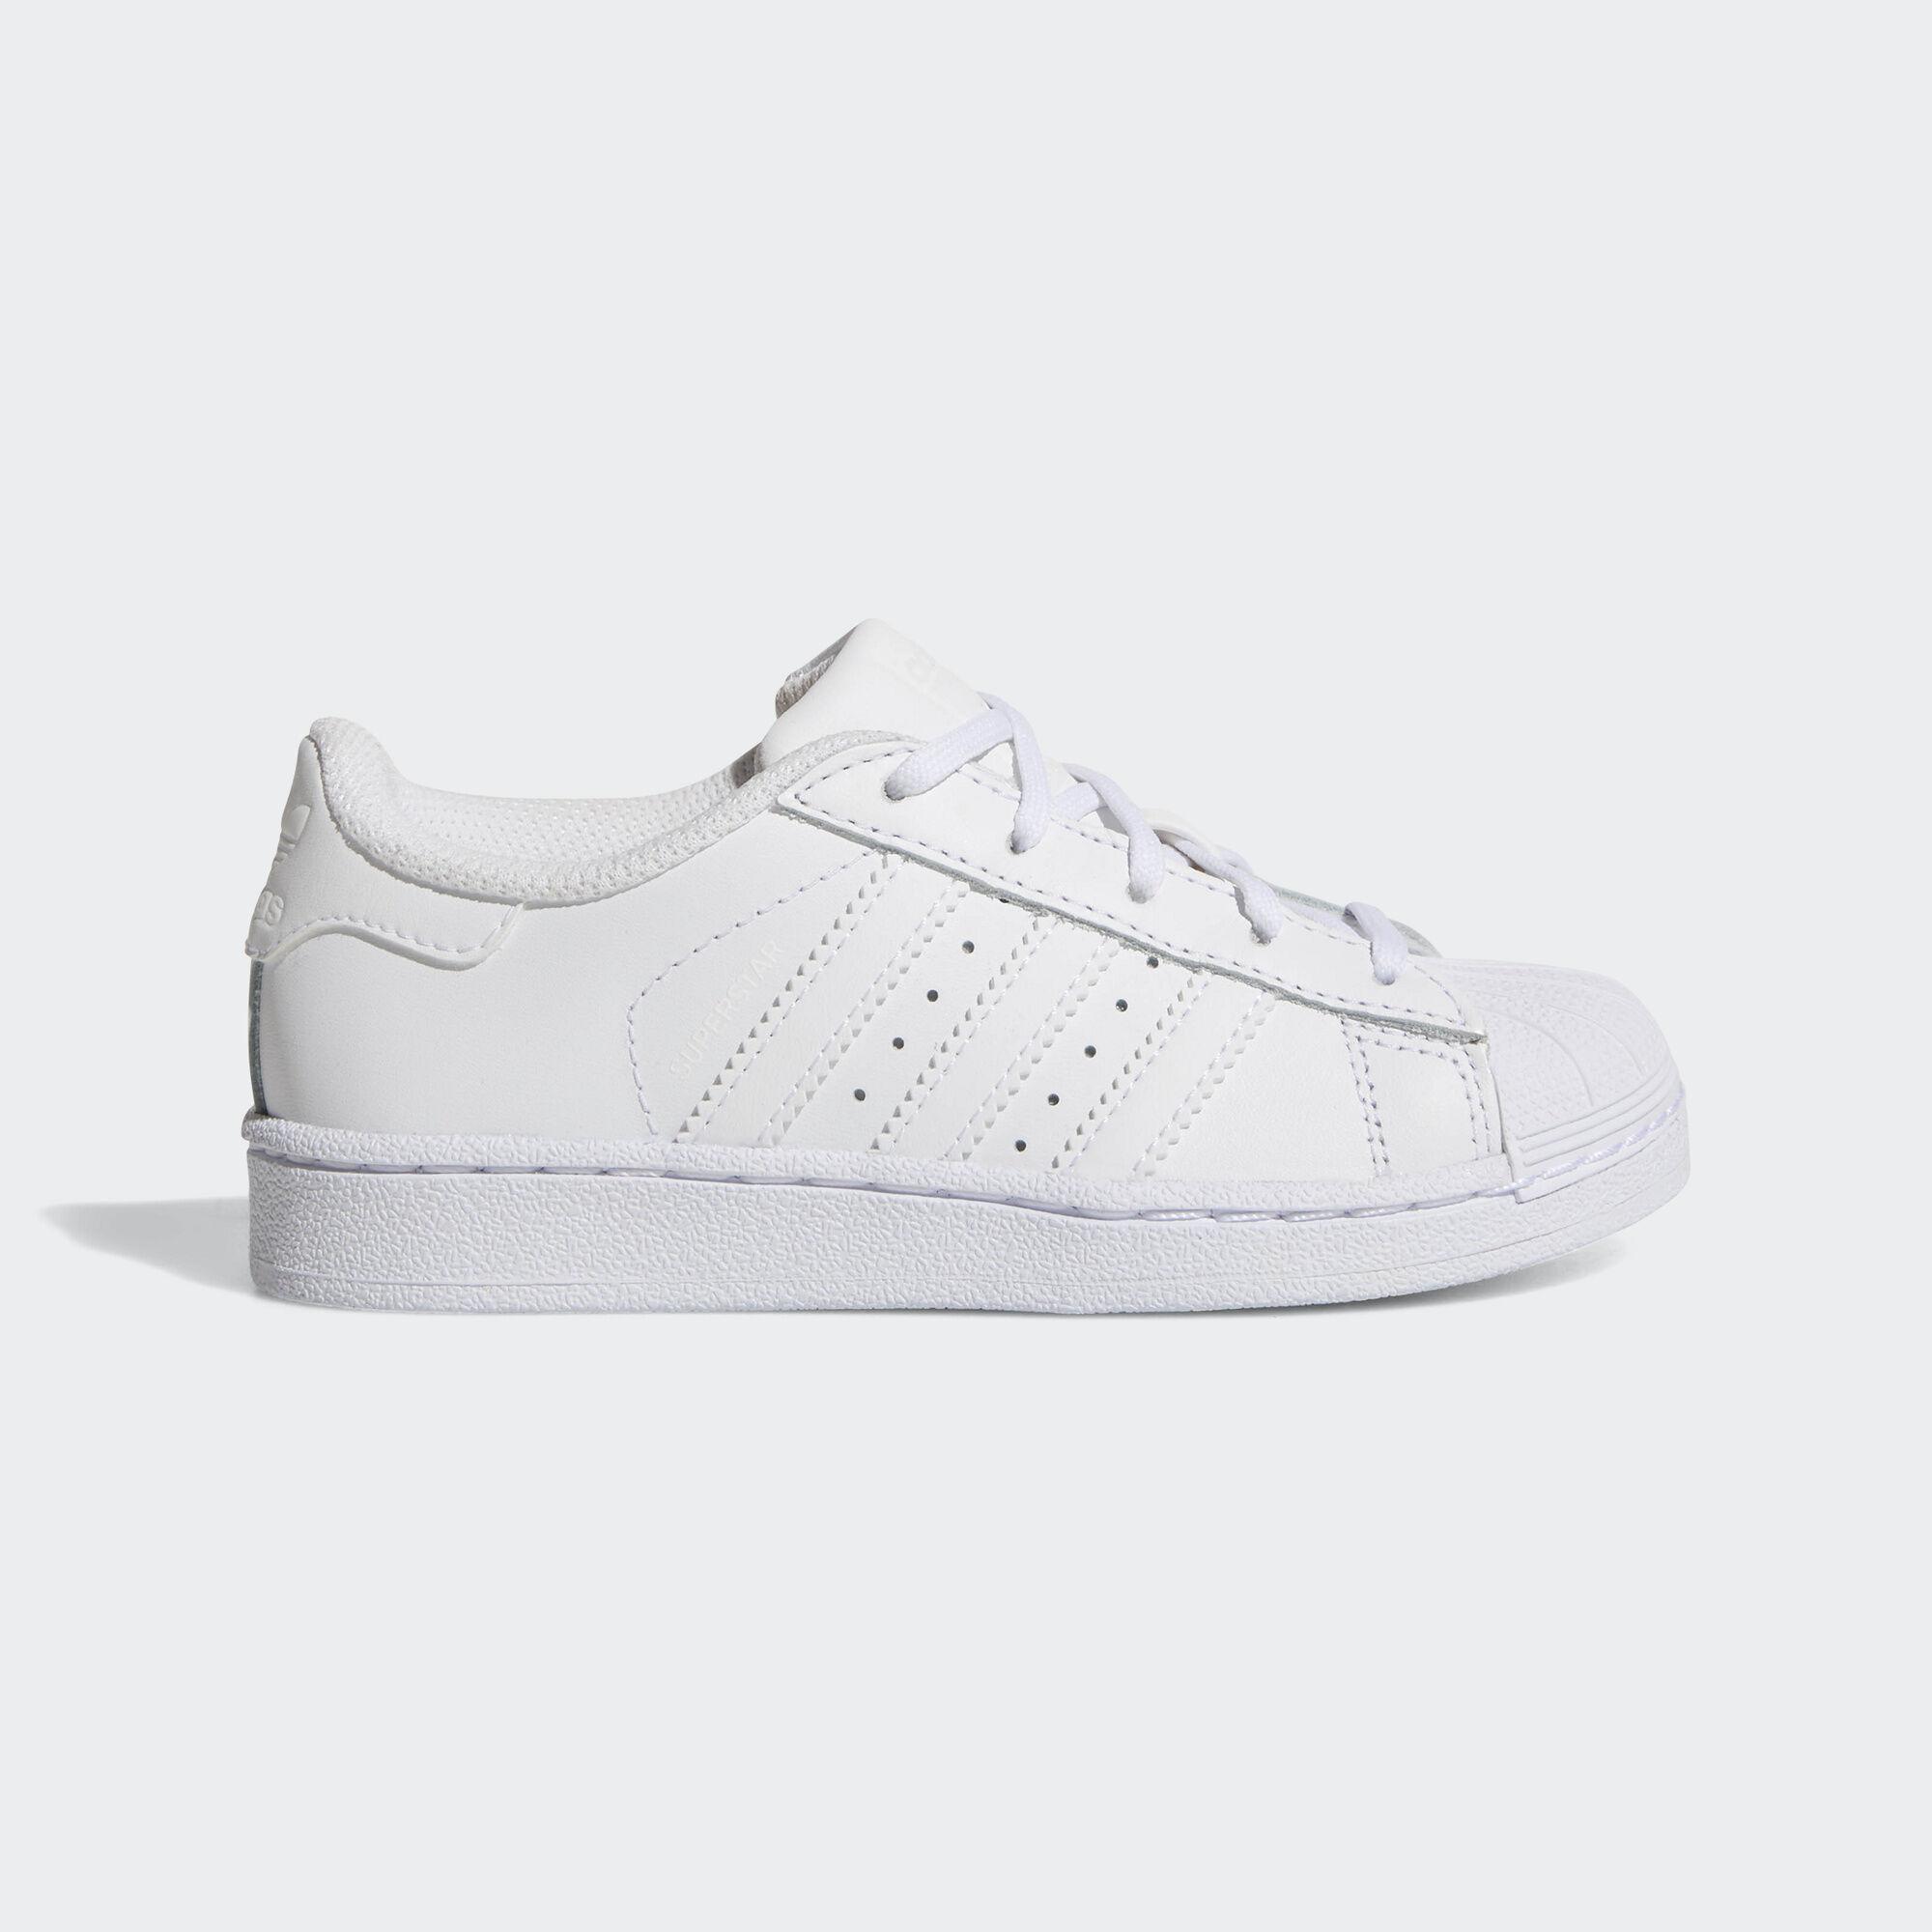 Adidas Superstar Founda Sneakers Ftw WhiteFtw WhiteFtw White